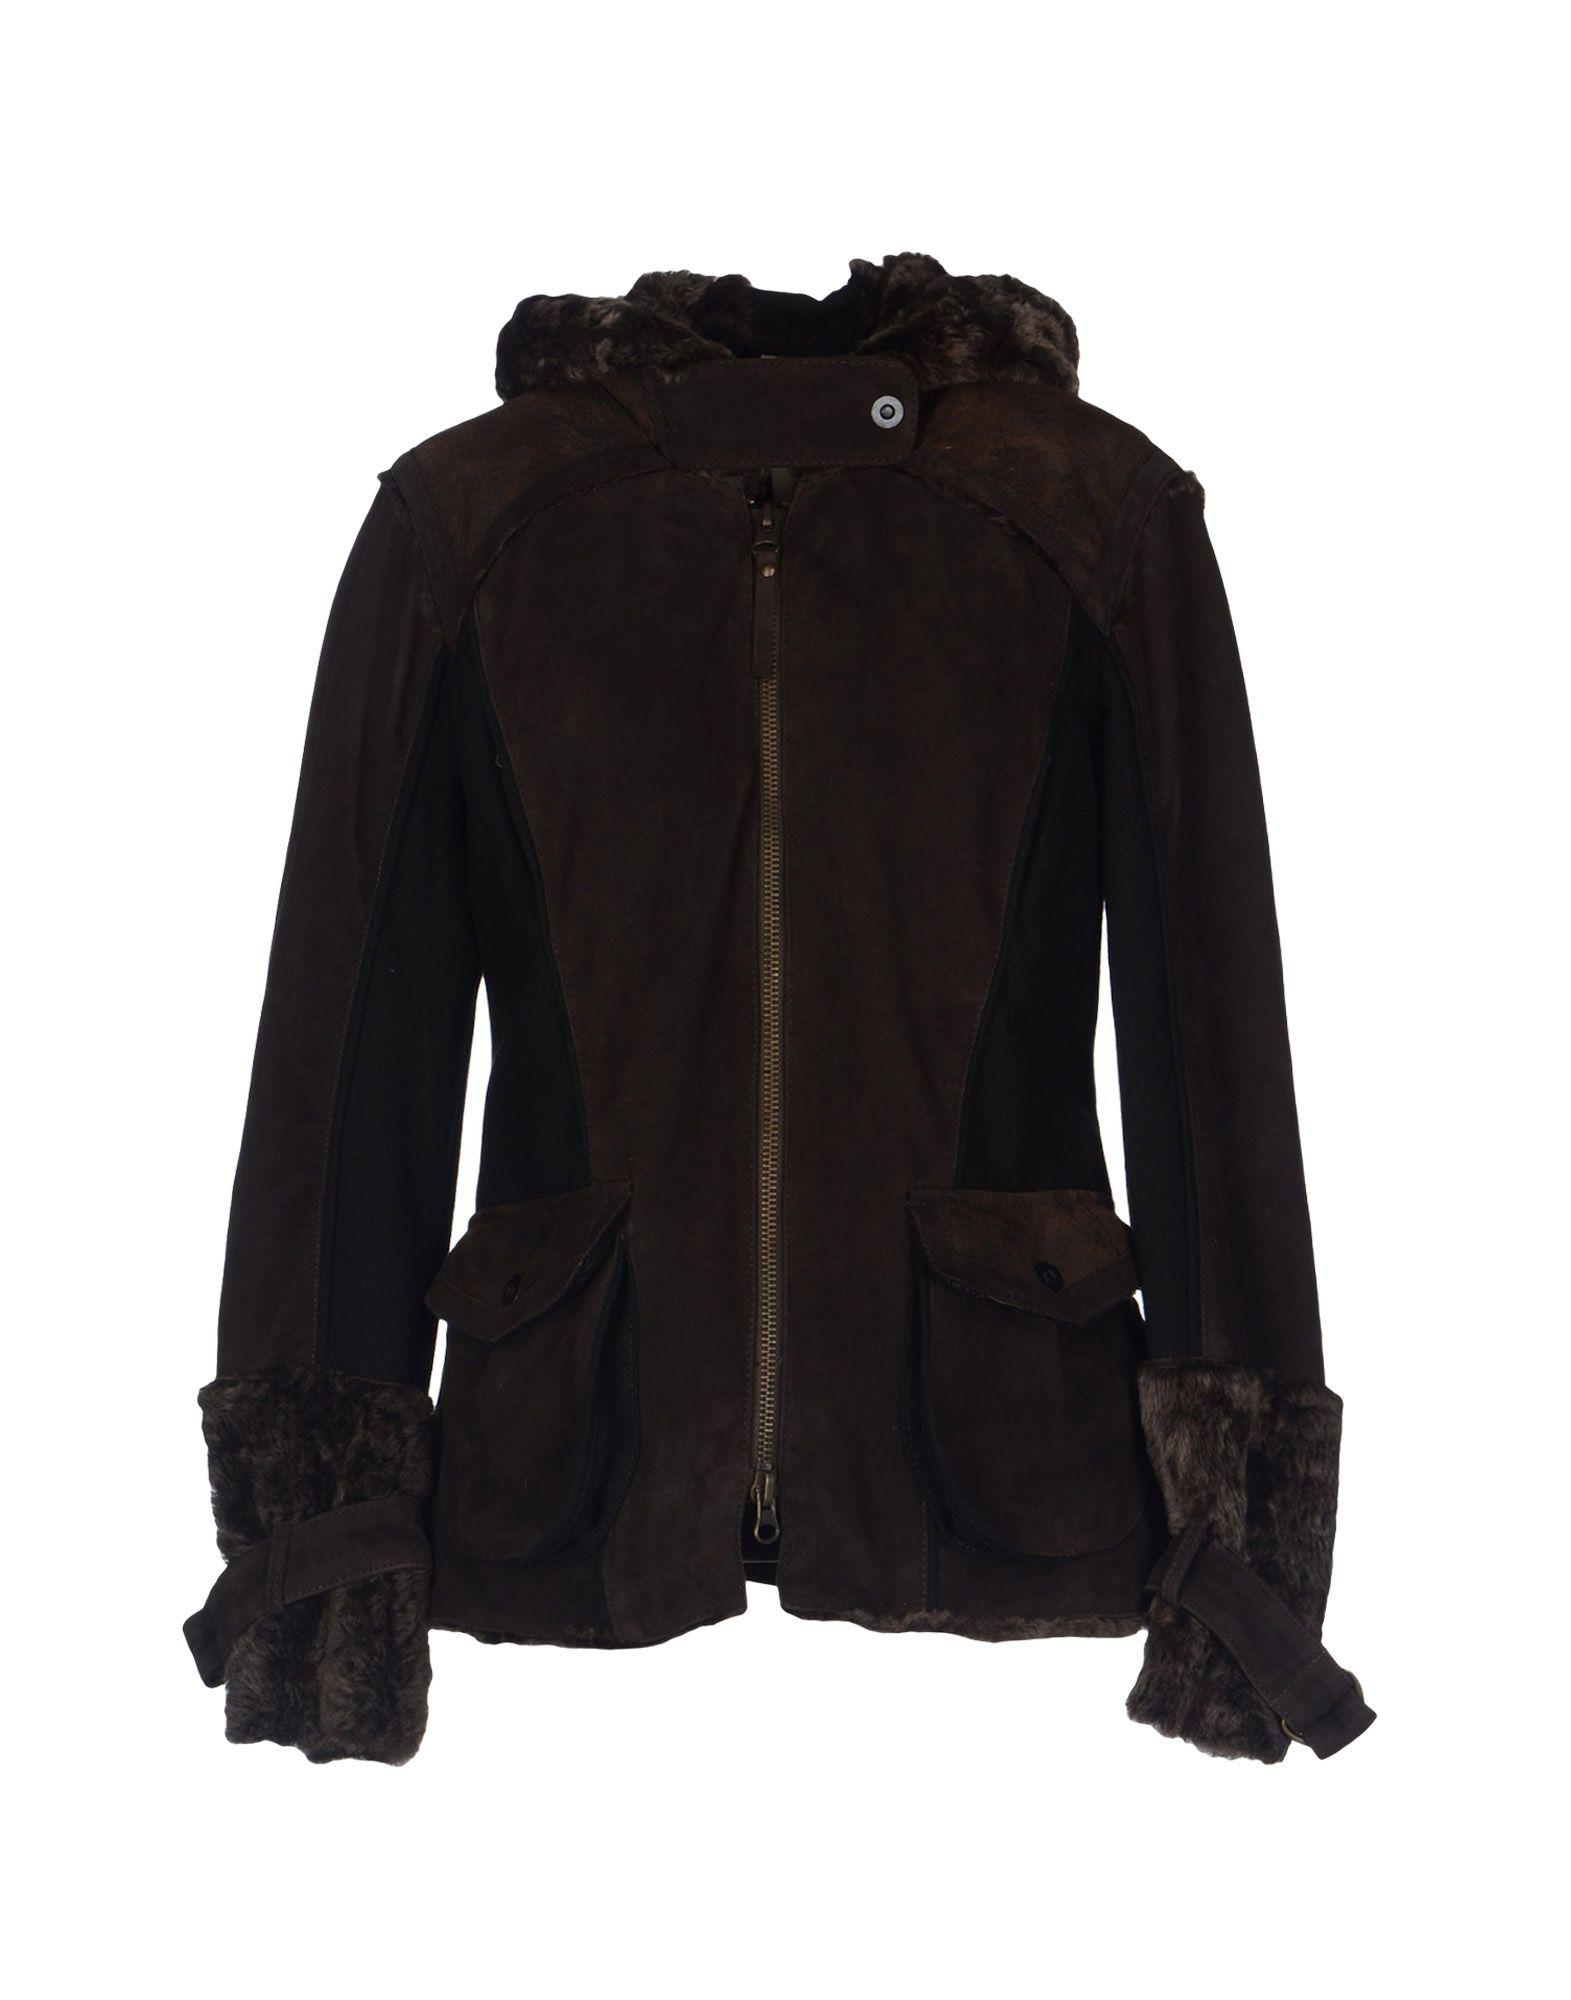 COMPAGNIA Damen Lederjacke/Mantel Farbe Dunkelbraun Größe 5